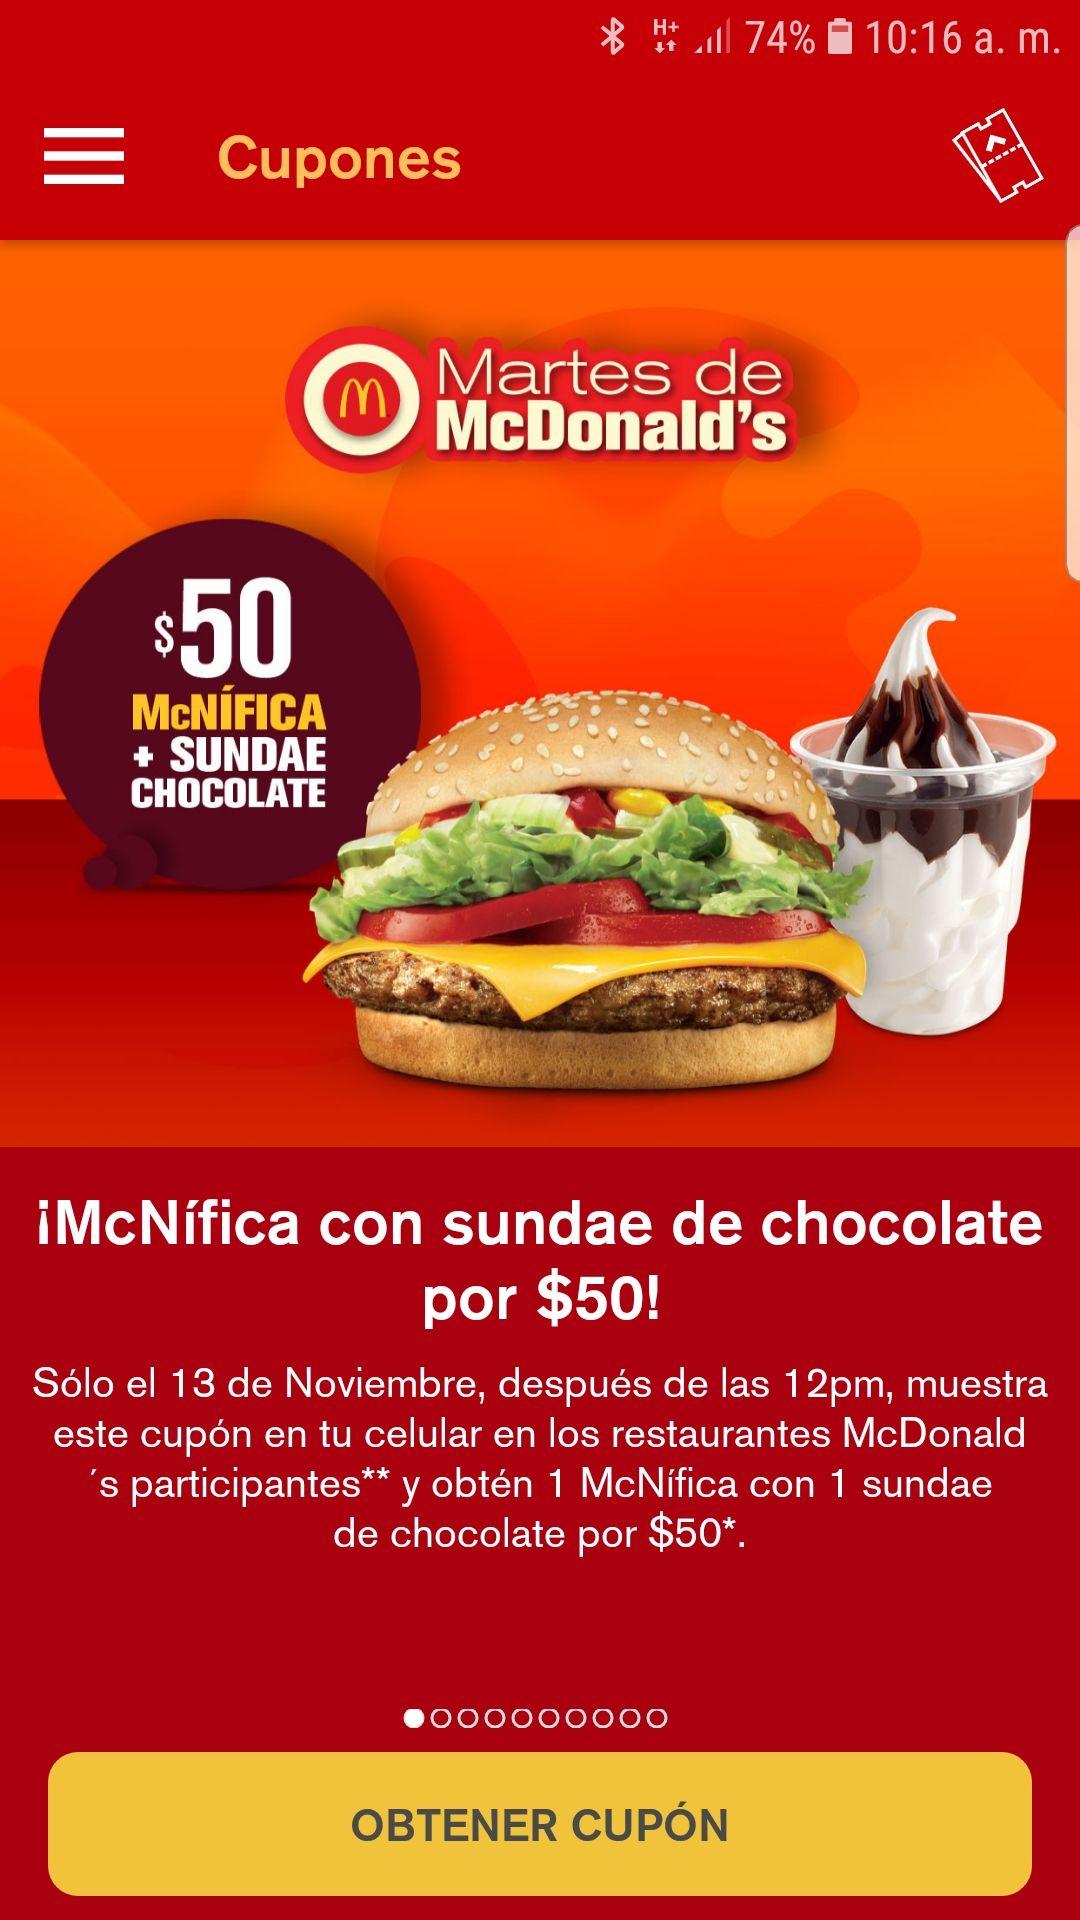 McDonald's: martes de haburguesas, Una hamburguesa magnífica con nieve por $50.00